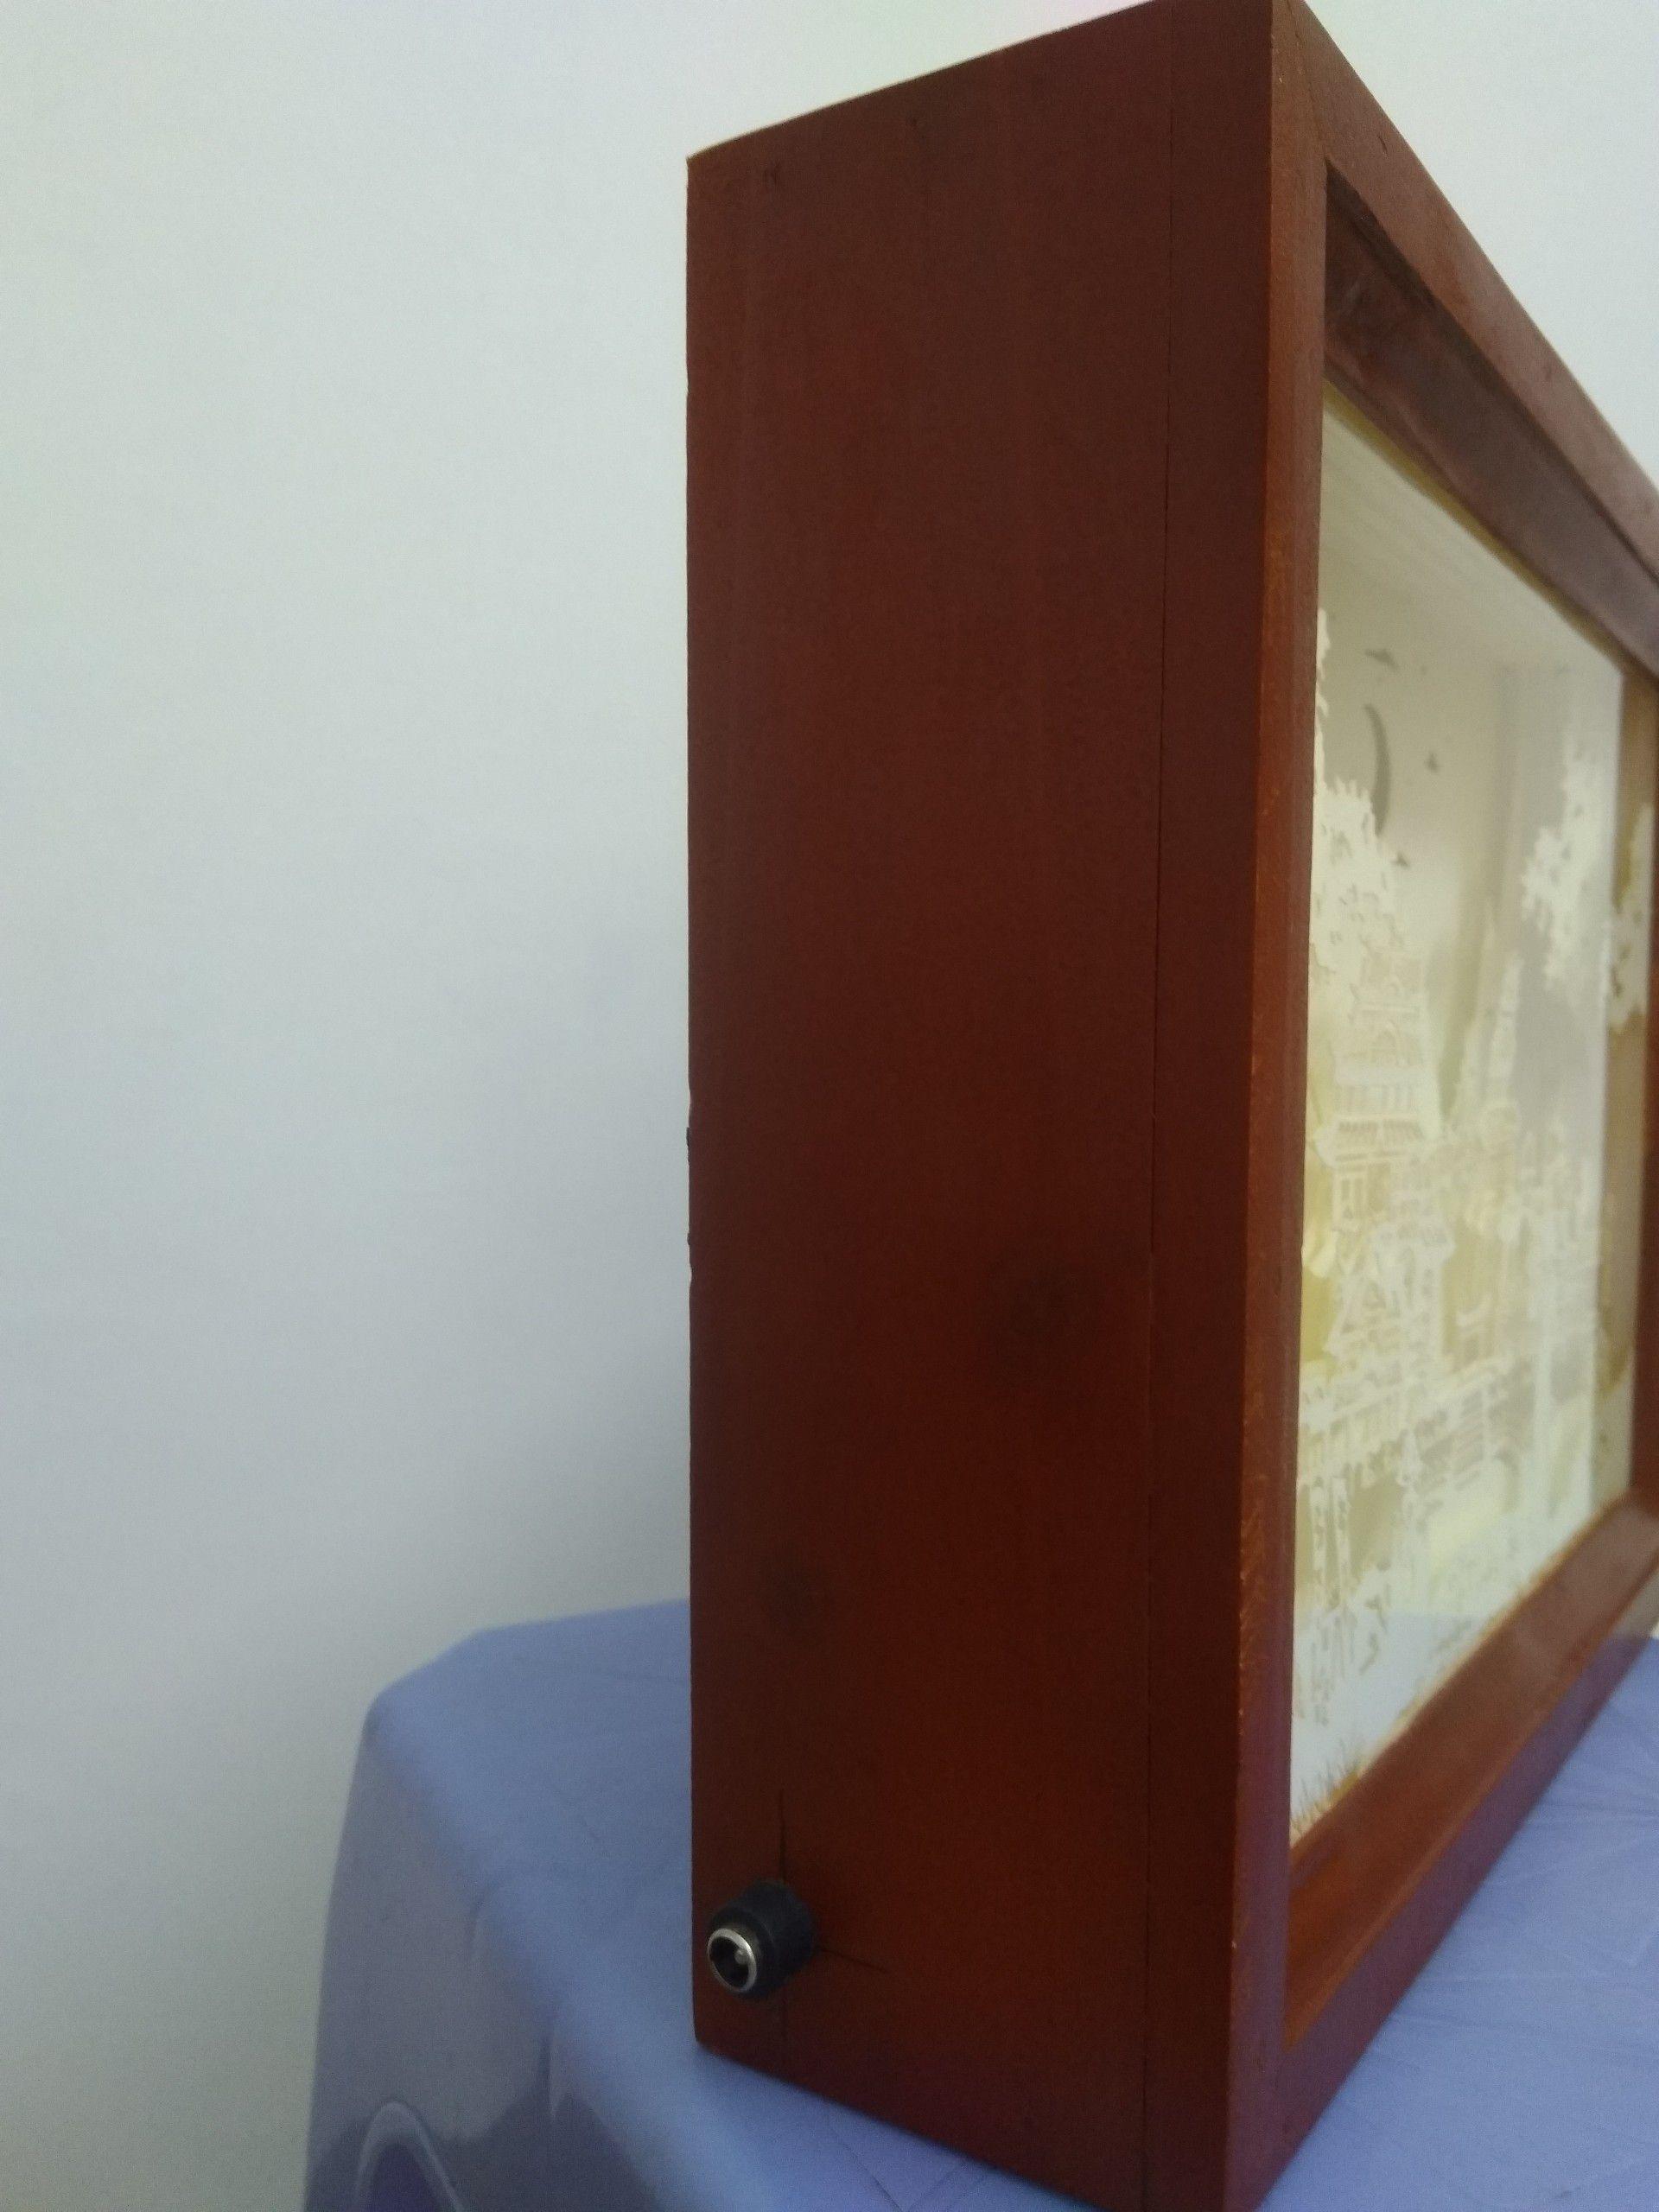 shadowbox woodtoy paperlightbox artbox kidbox